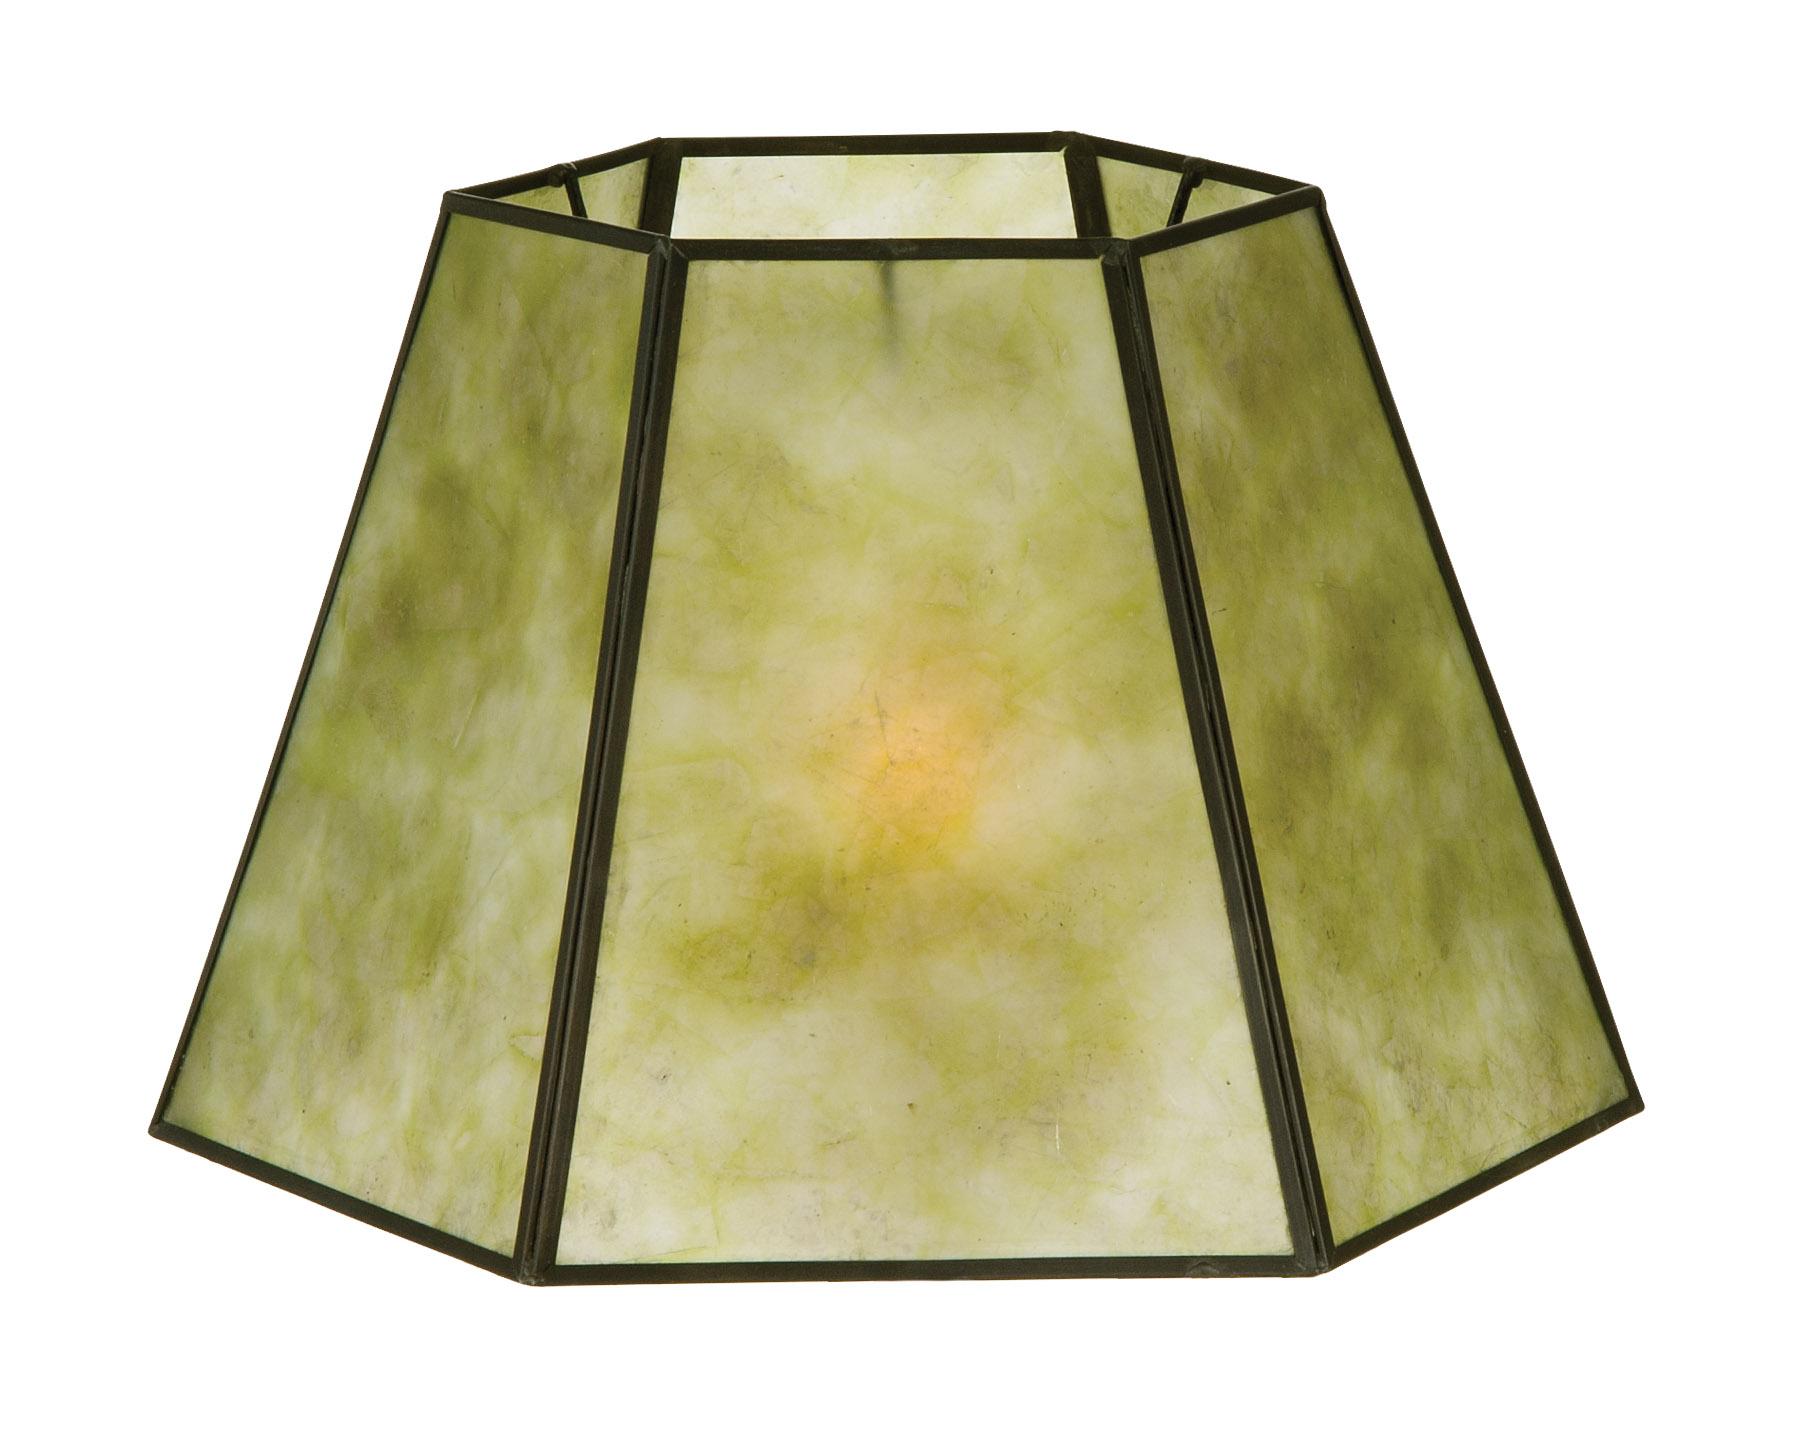 05702G   Craftsman Green Hexagon Style Mica Lampshade